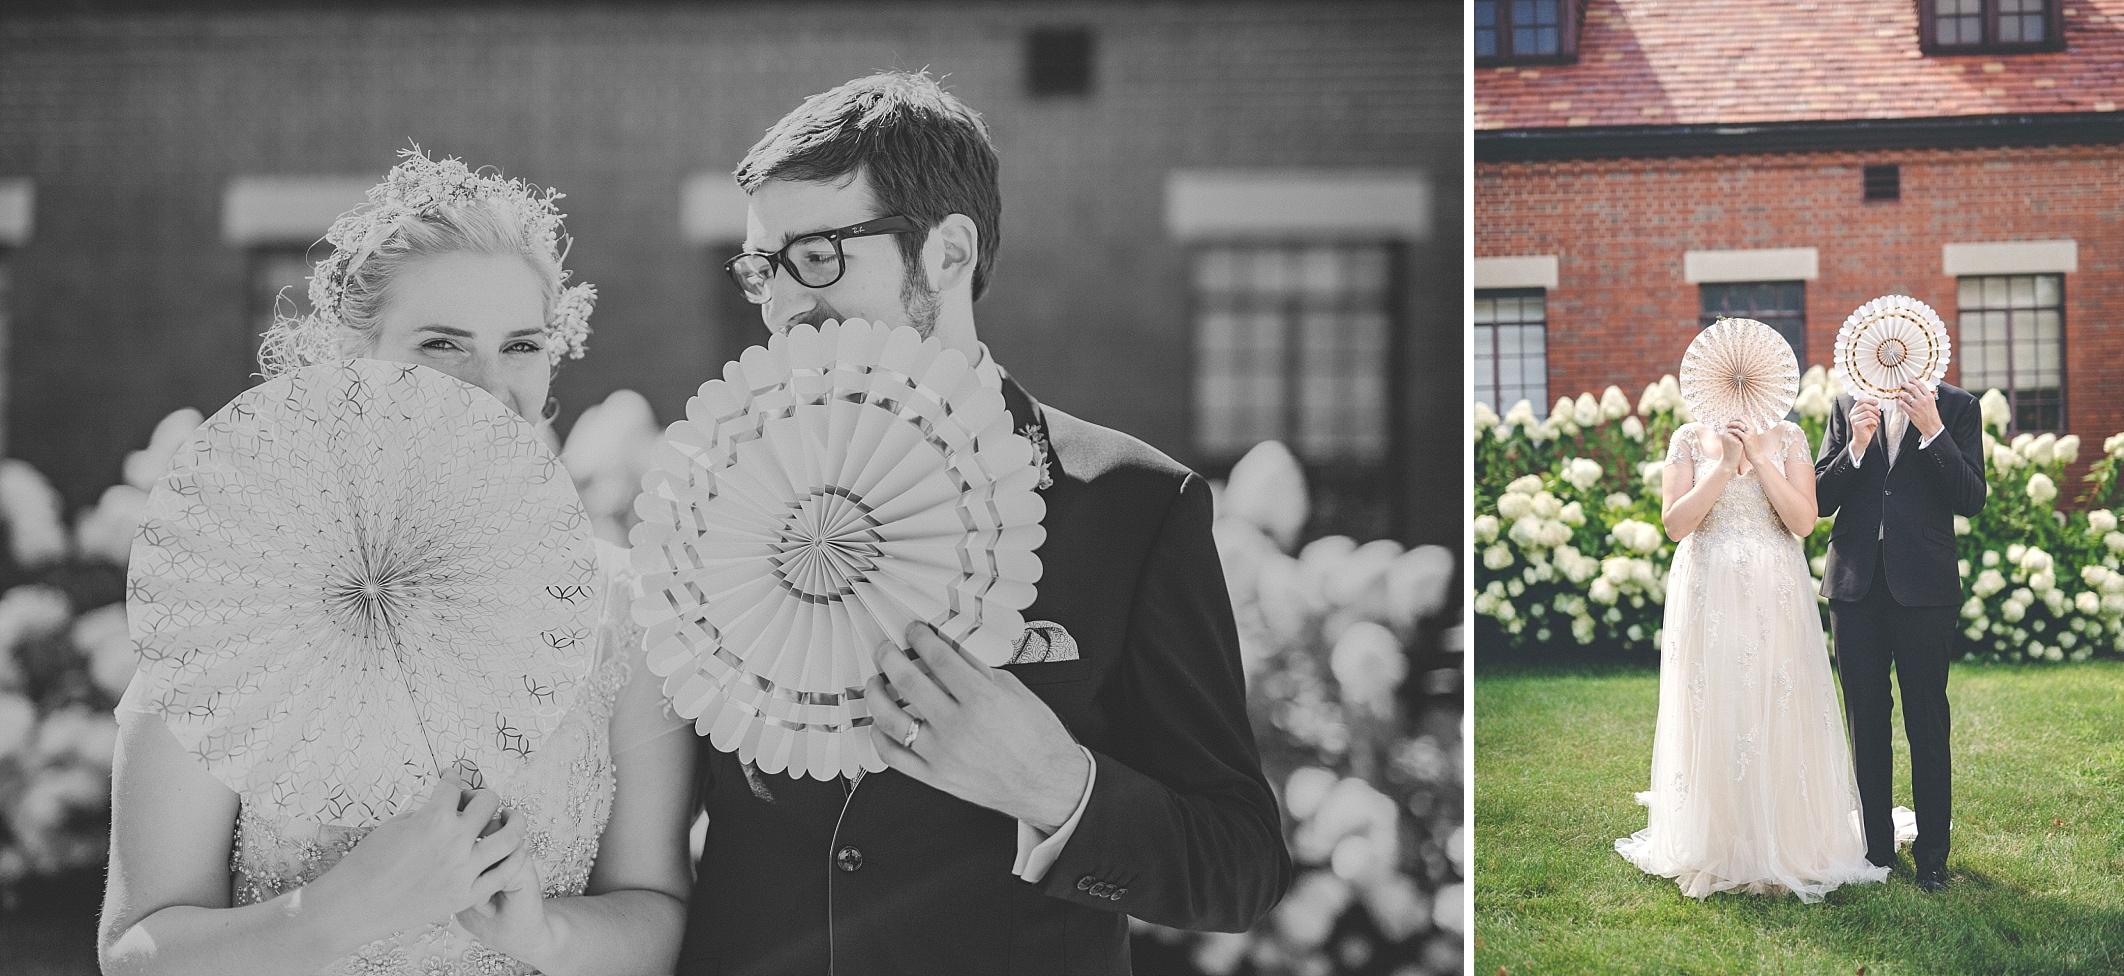 wedding-photographer-dayton-ohio_0106.jpg